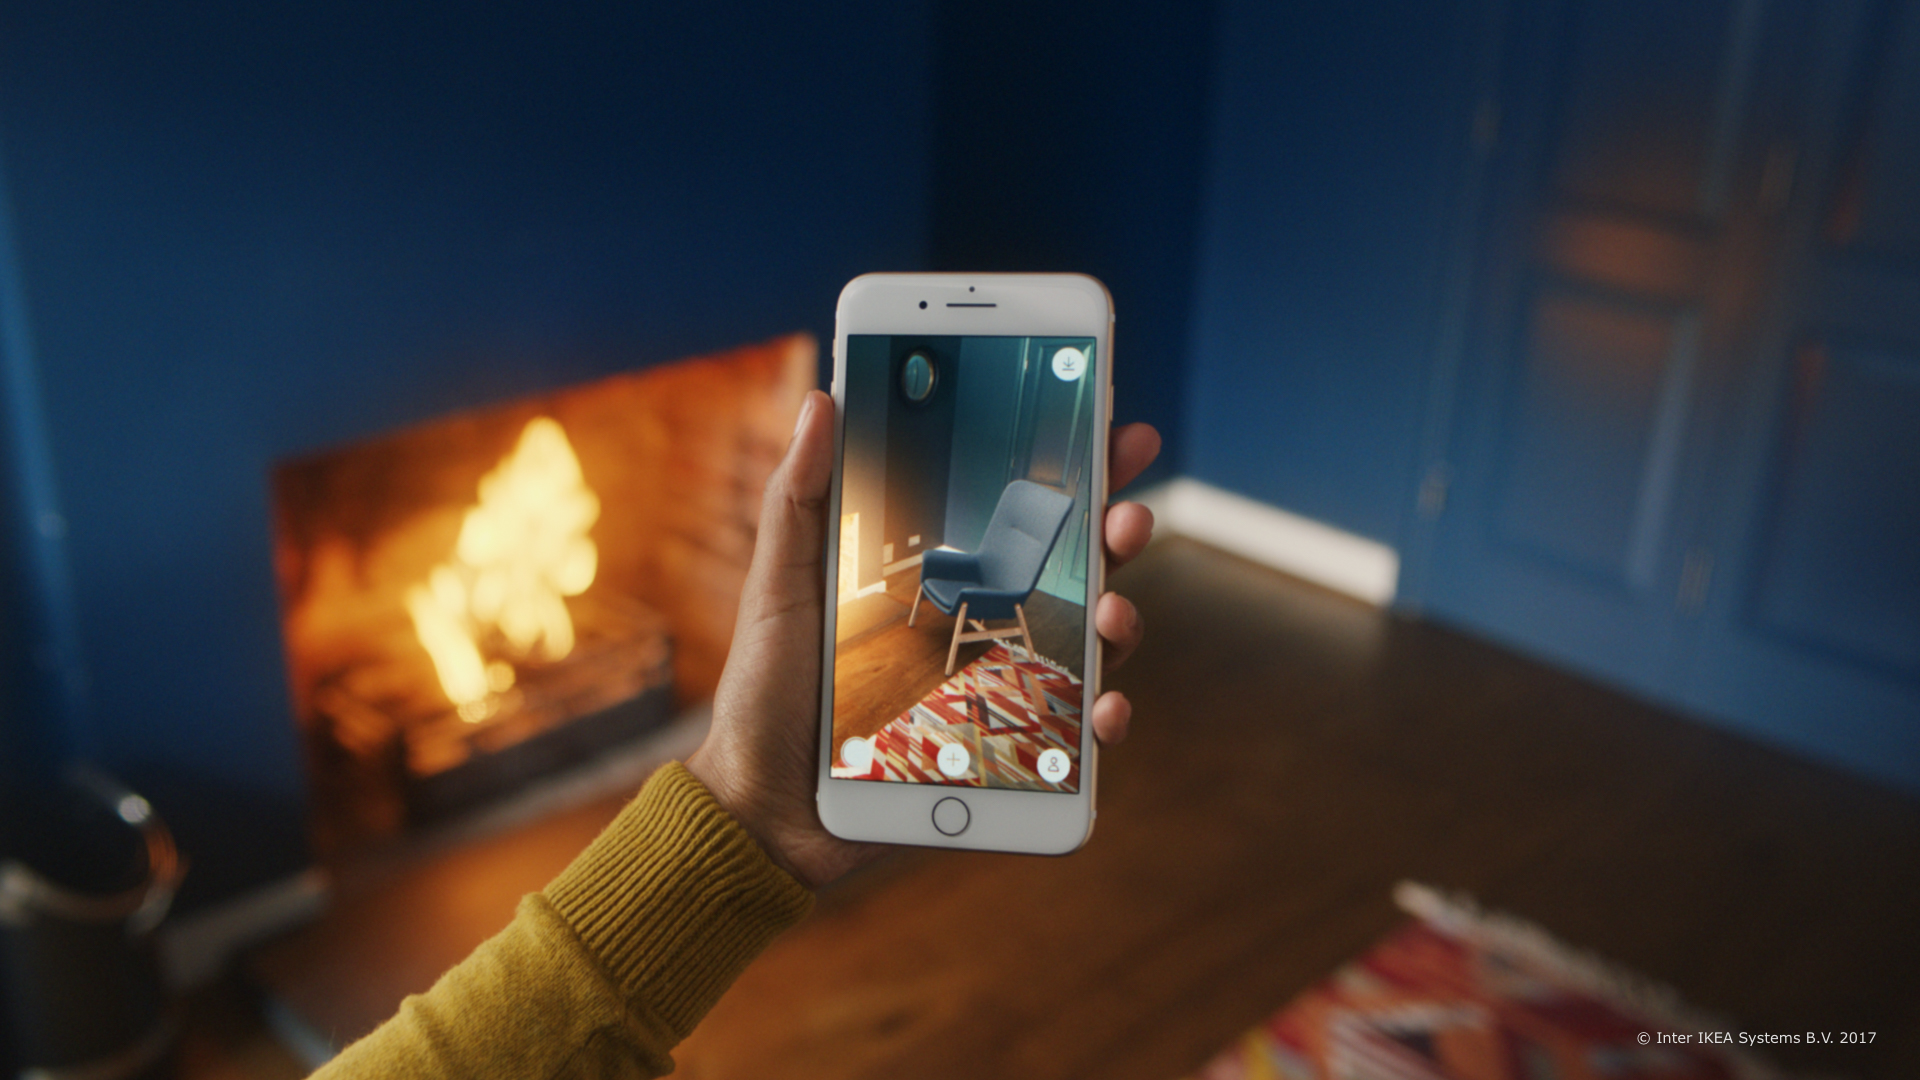 Mobelkauf Per App Augmented Reality Furs Wohnzimmer Wustenrot